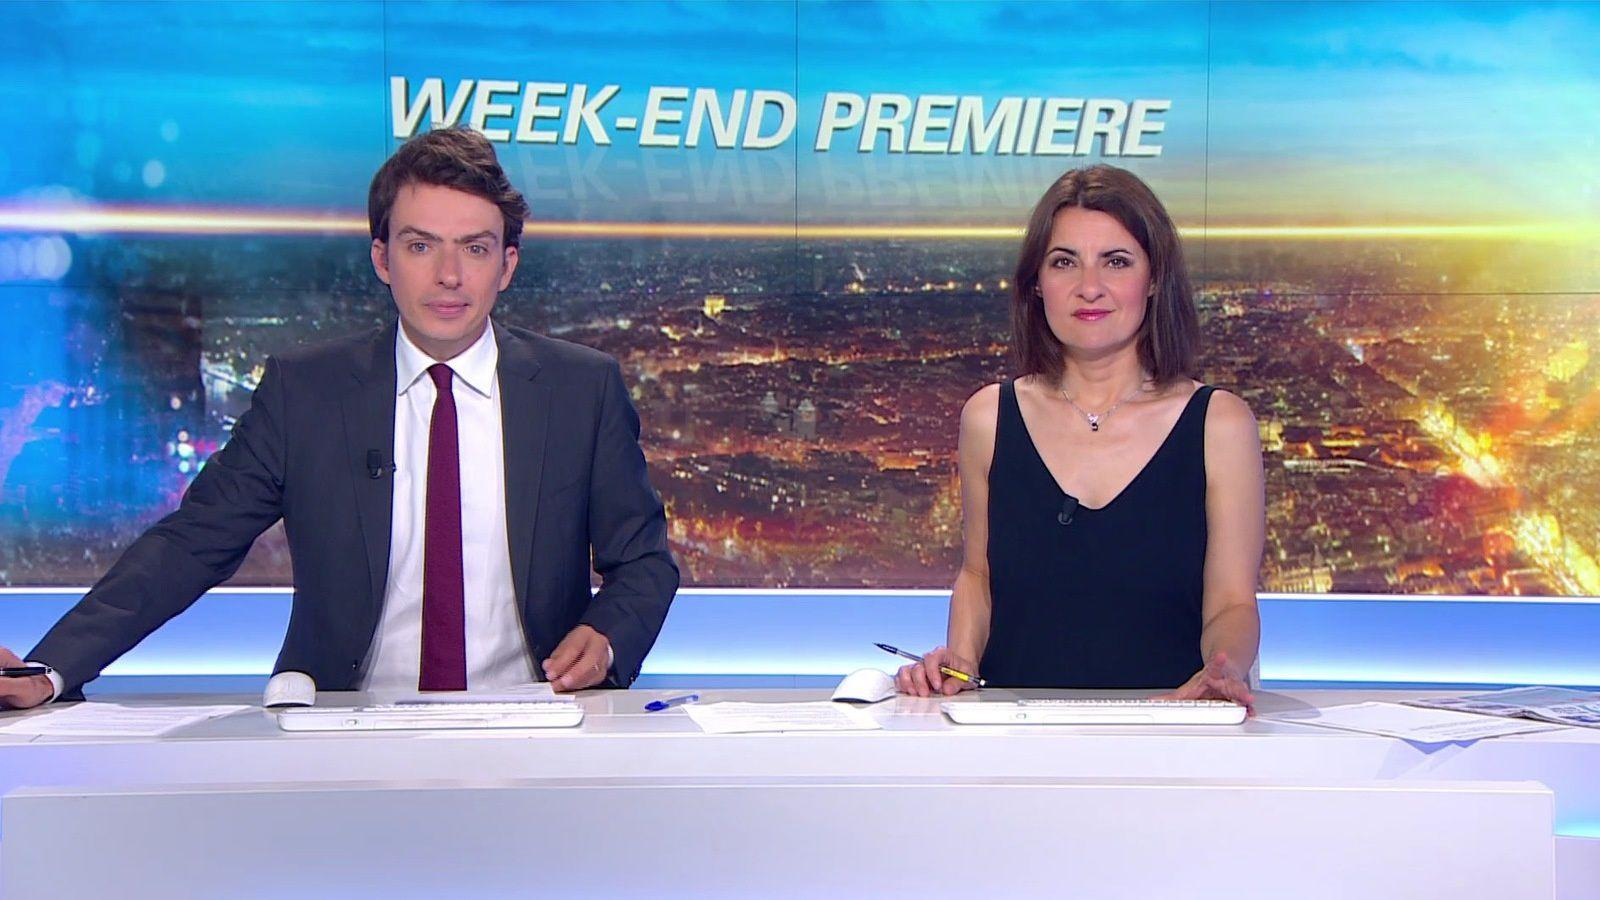 📸12 WEEK-END PREMIERE @BFMTV @BFMTVmatinaleWE @SandraGandoin @JohannaCarlosD8 ce matin #vuesalatele